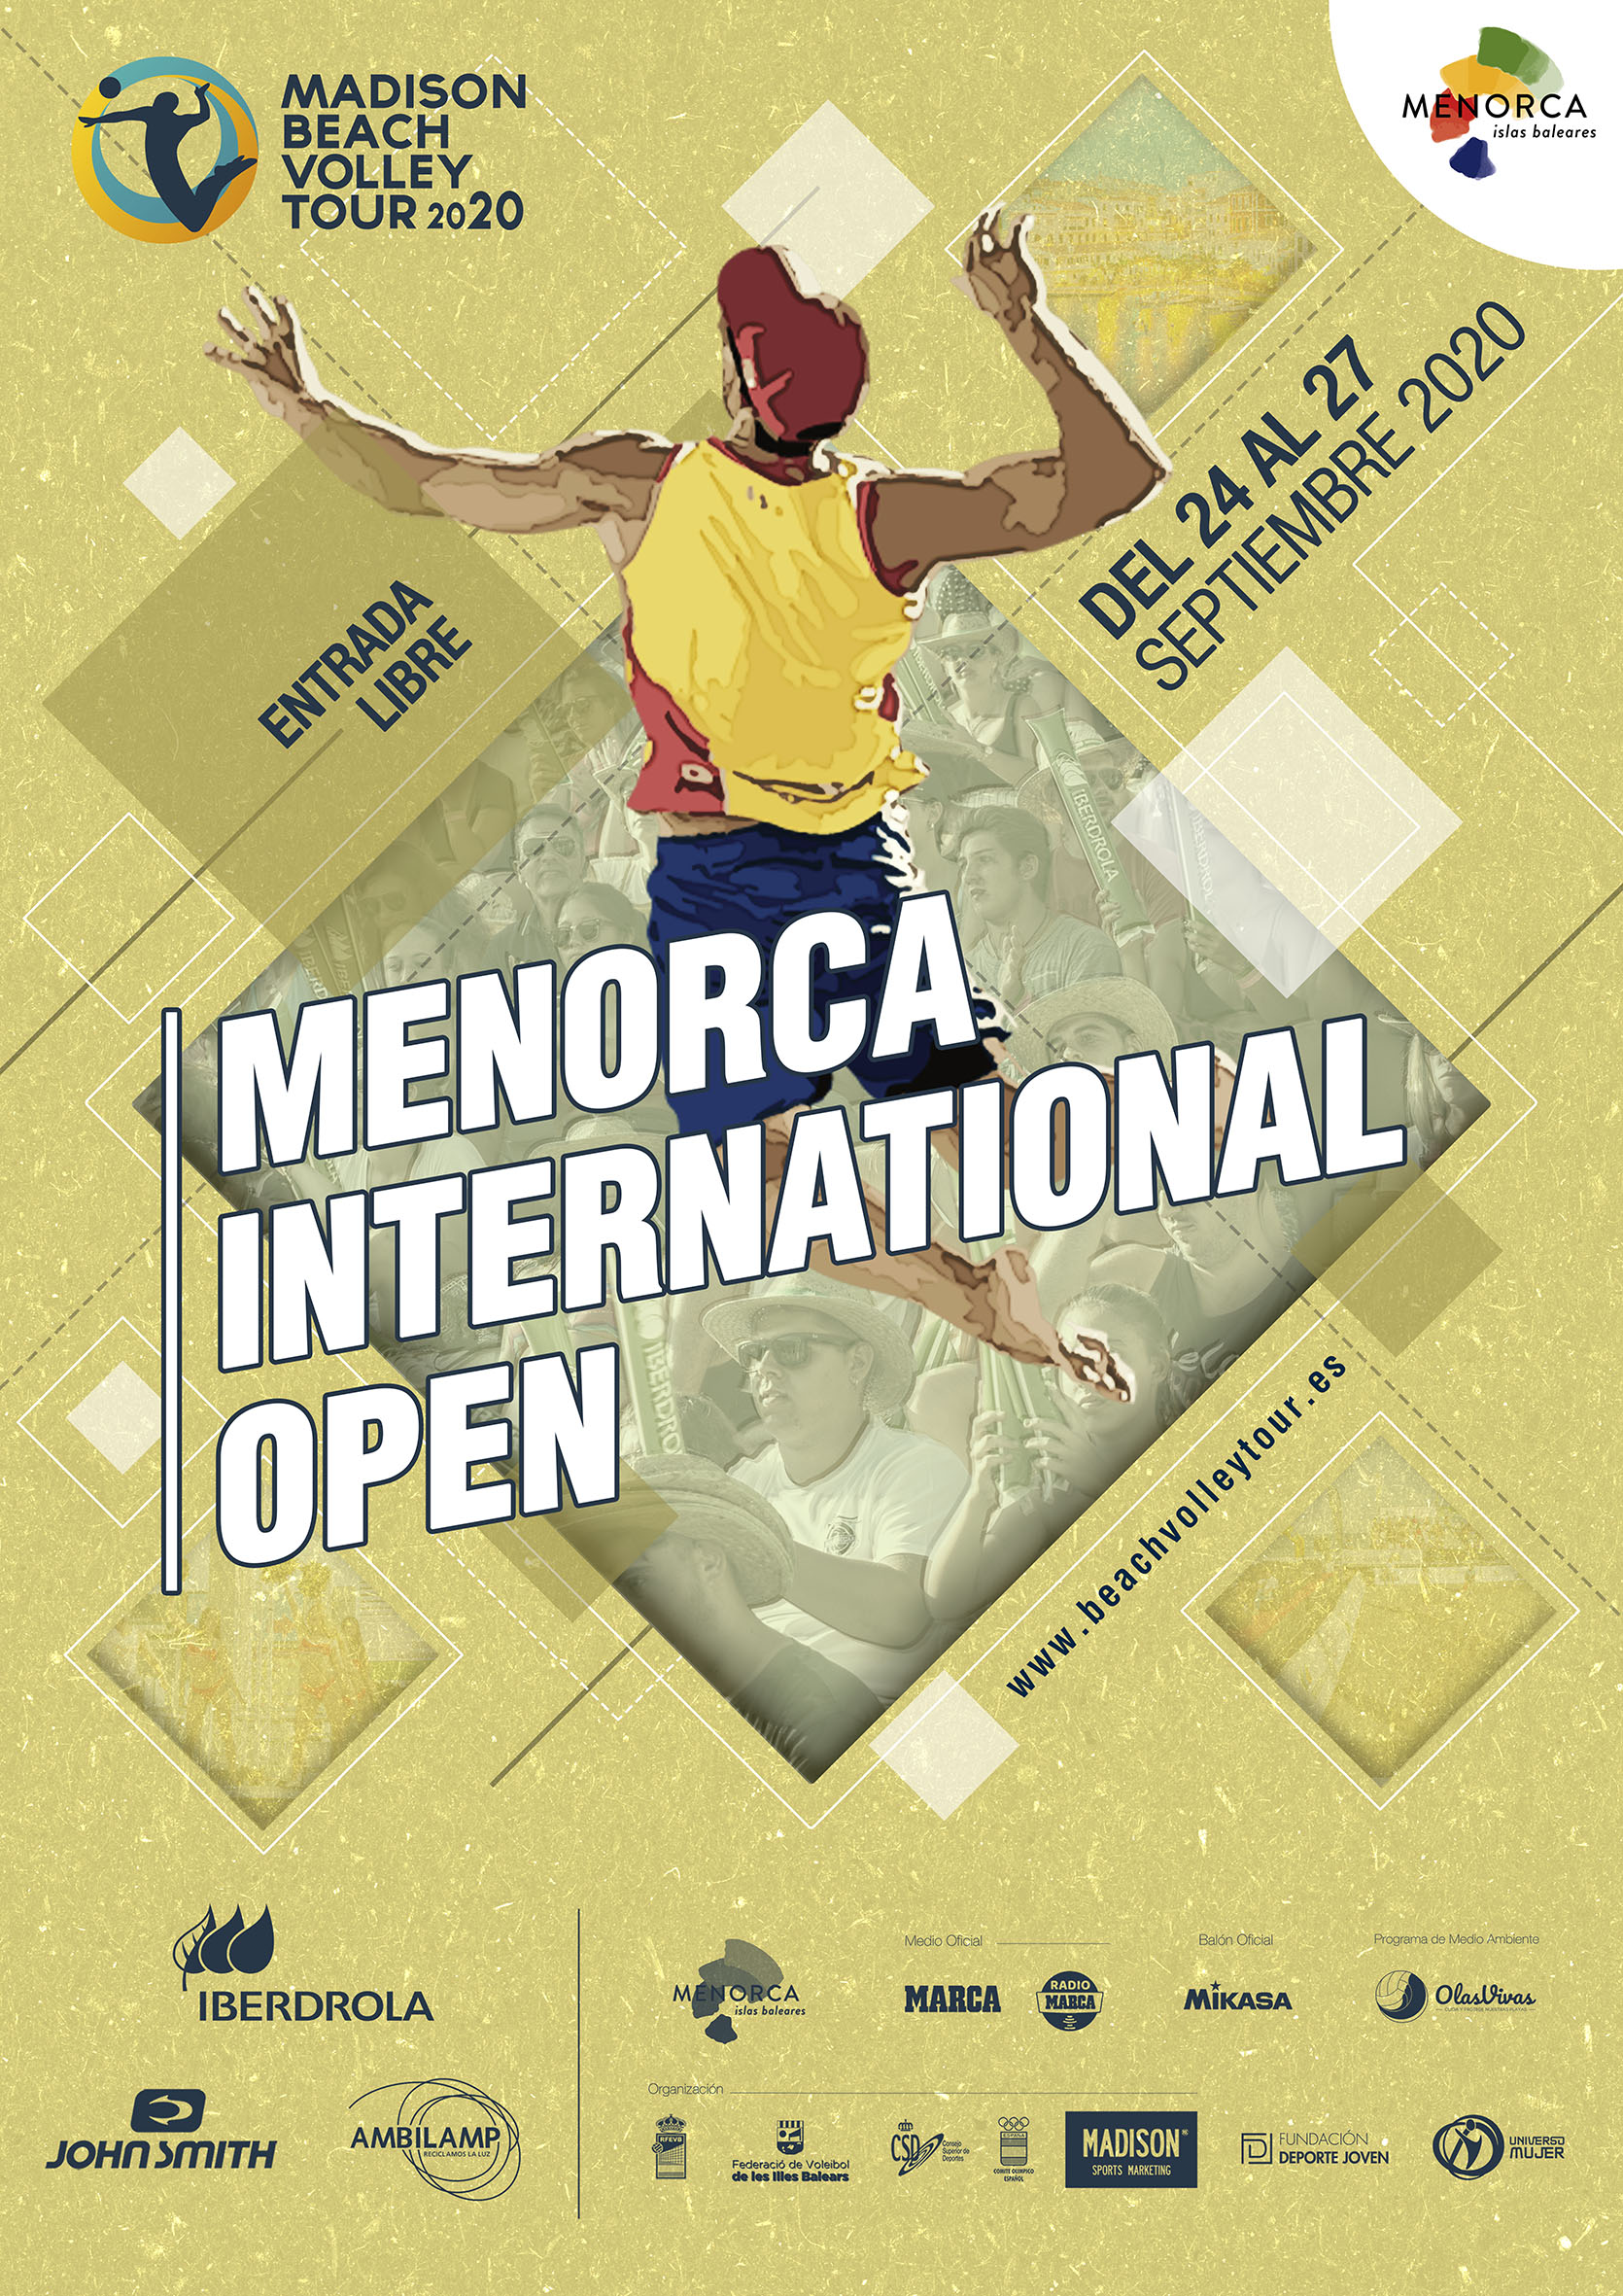 Madison Beach Volley Tour 2020